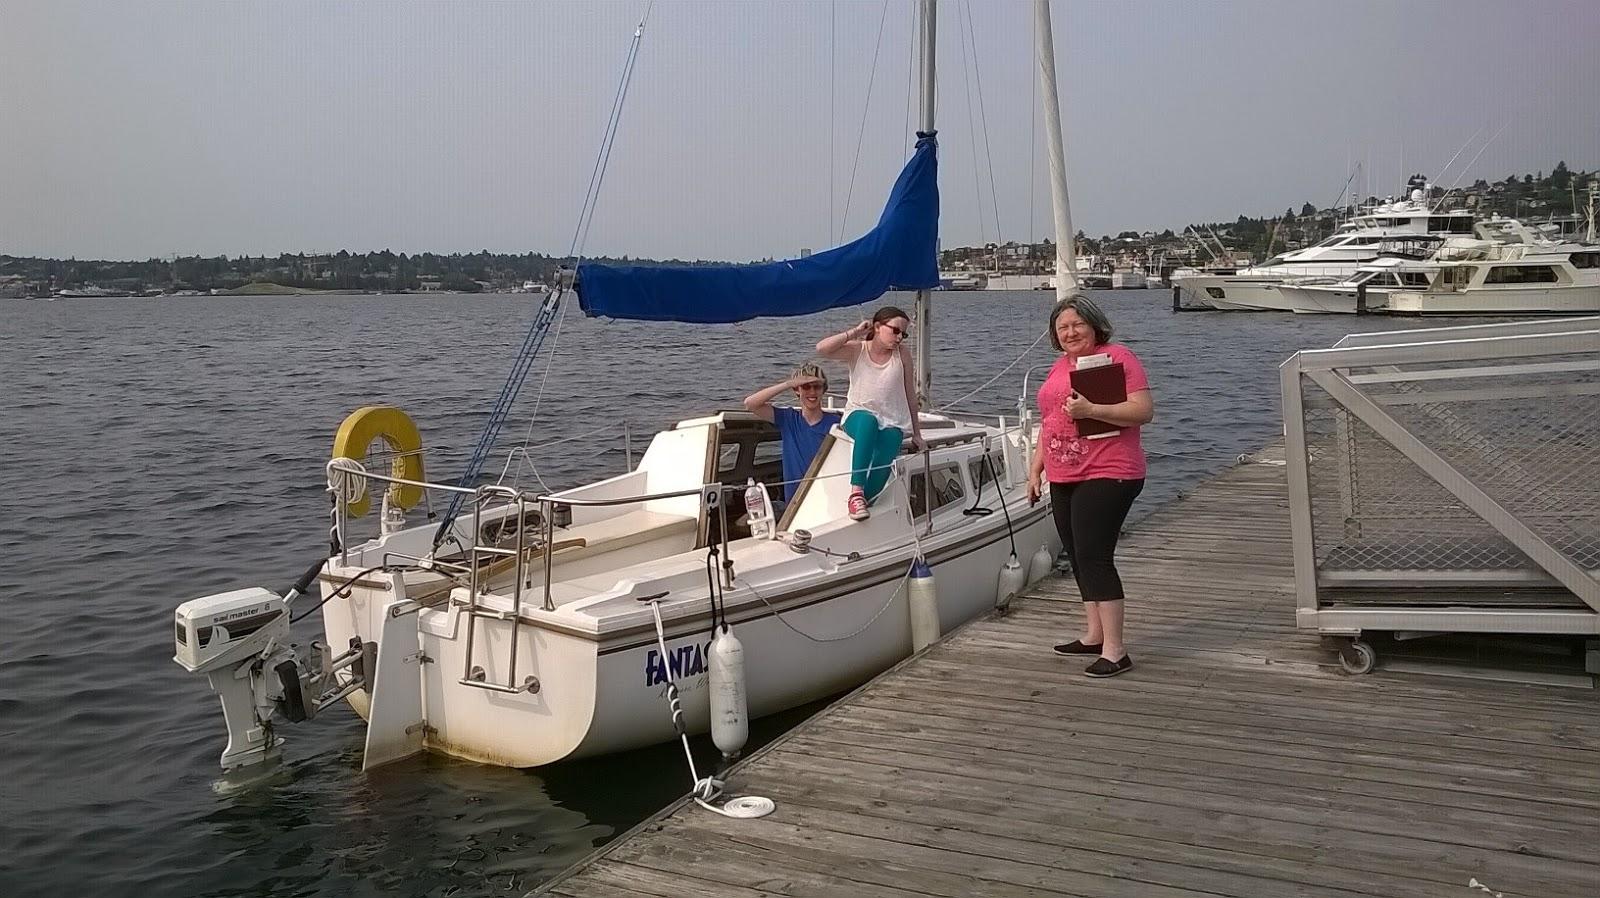 The Catalina 22 Yacht's Log: Sailing to Lake Union